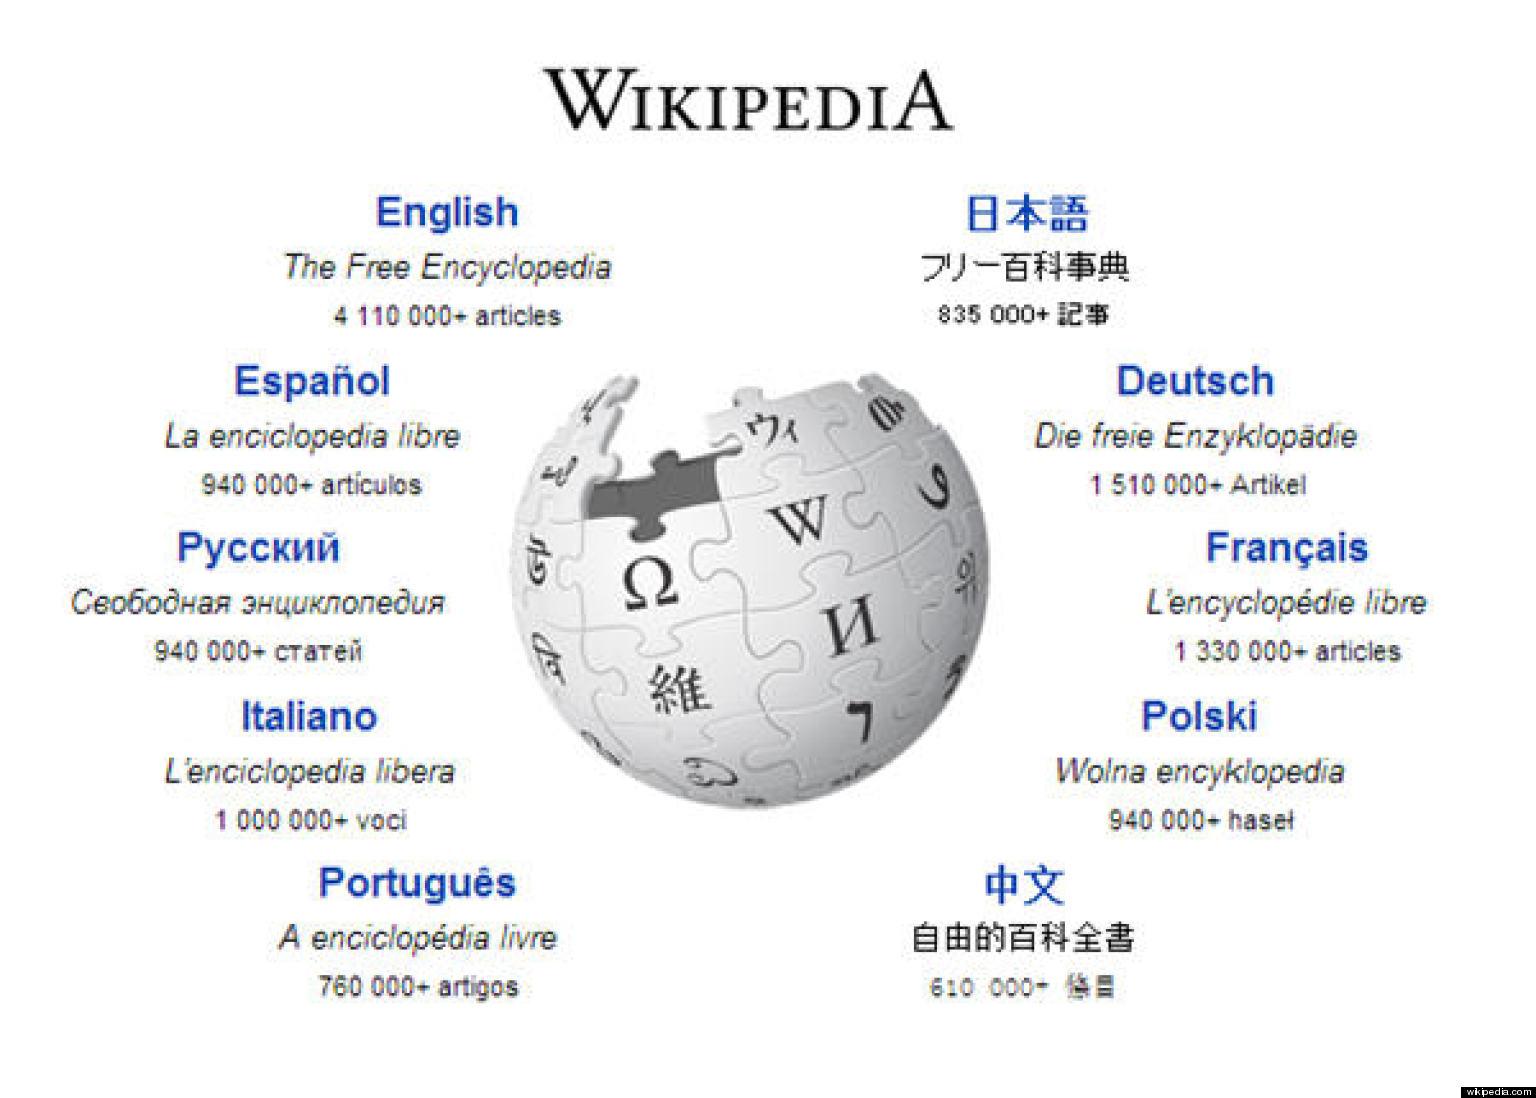 huffpost wikipedia wikipedia verliert autoren wikipedia